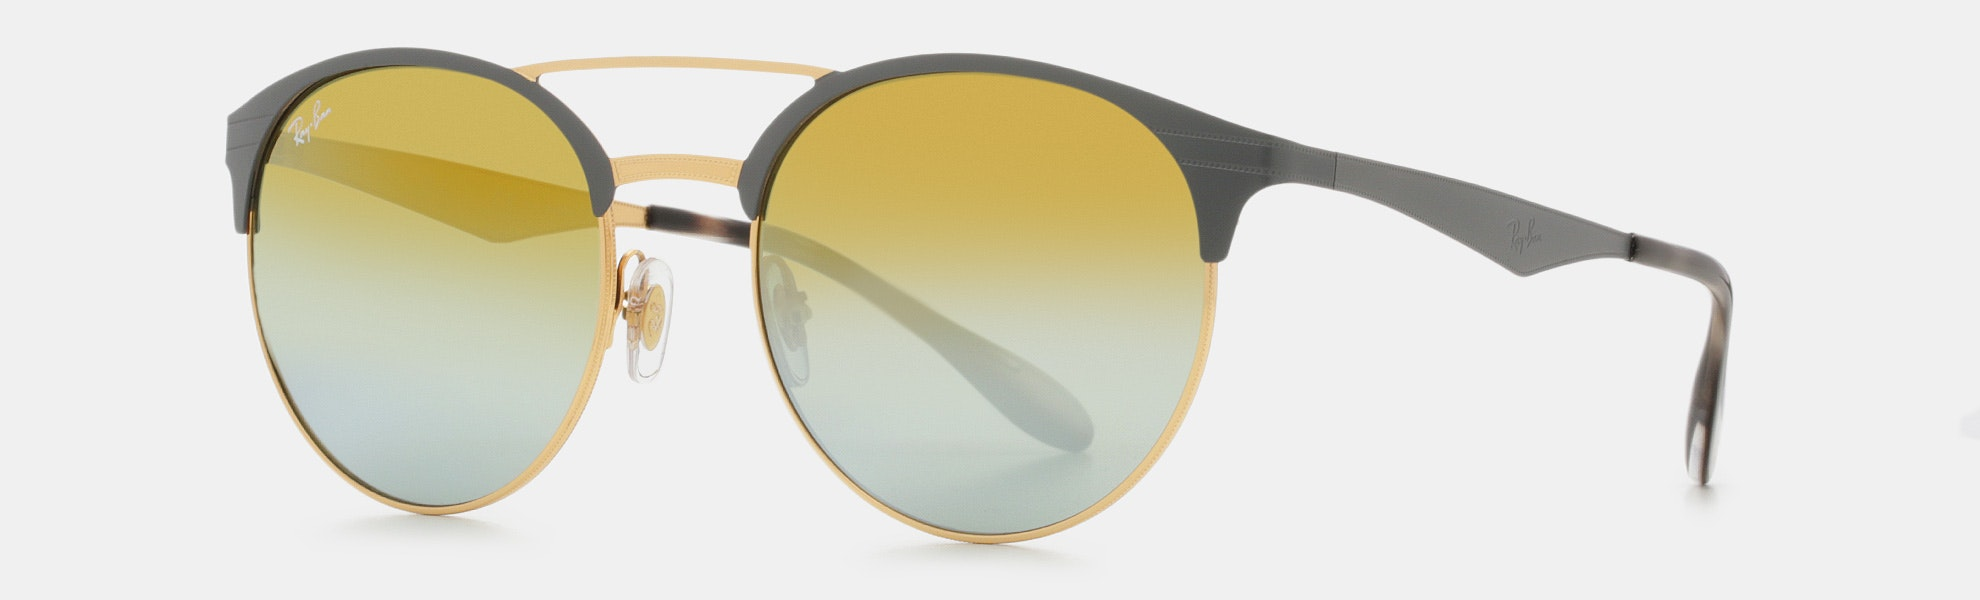 Ray-Ban RB3545 Sunglasses